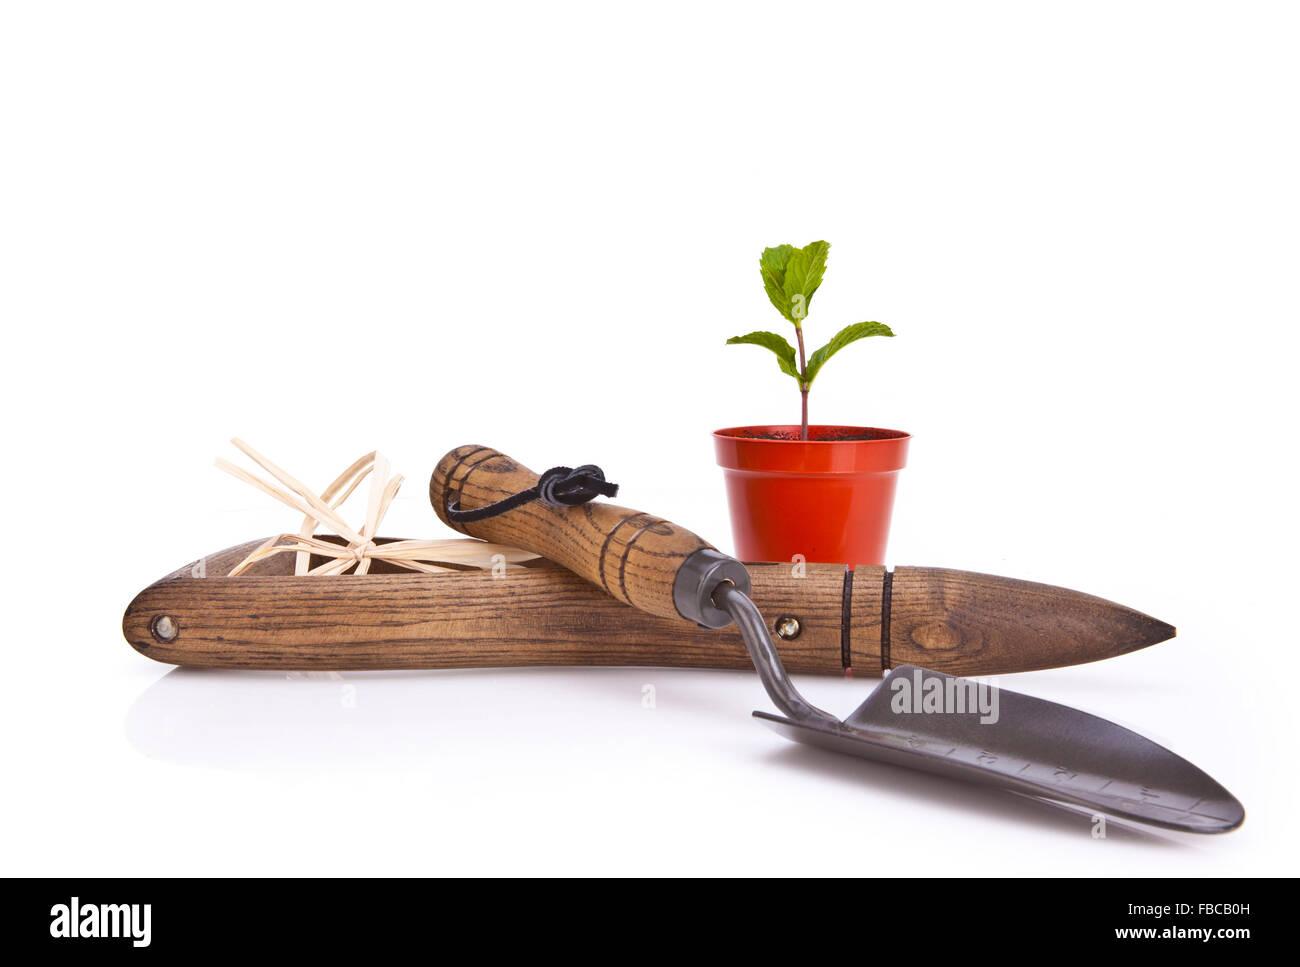 Attrezzi per giardinaggio ed impianto pentola su sfondo bianco Foto Stock